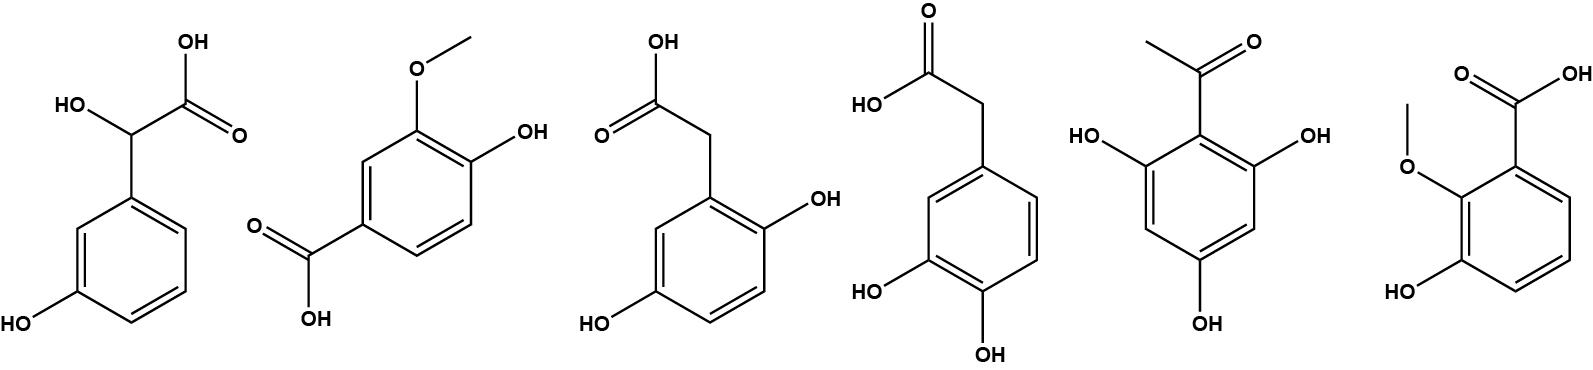 verschillende molecuulstructuren C8H8O4